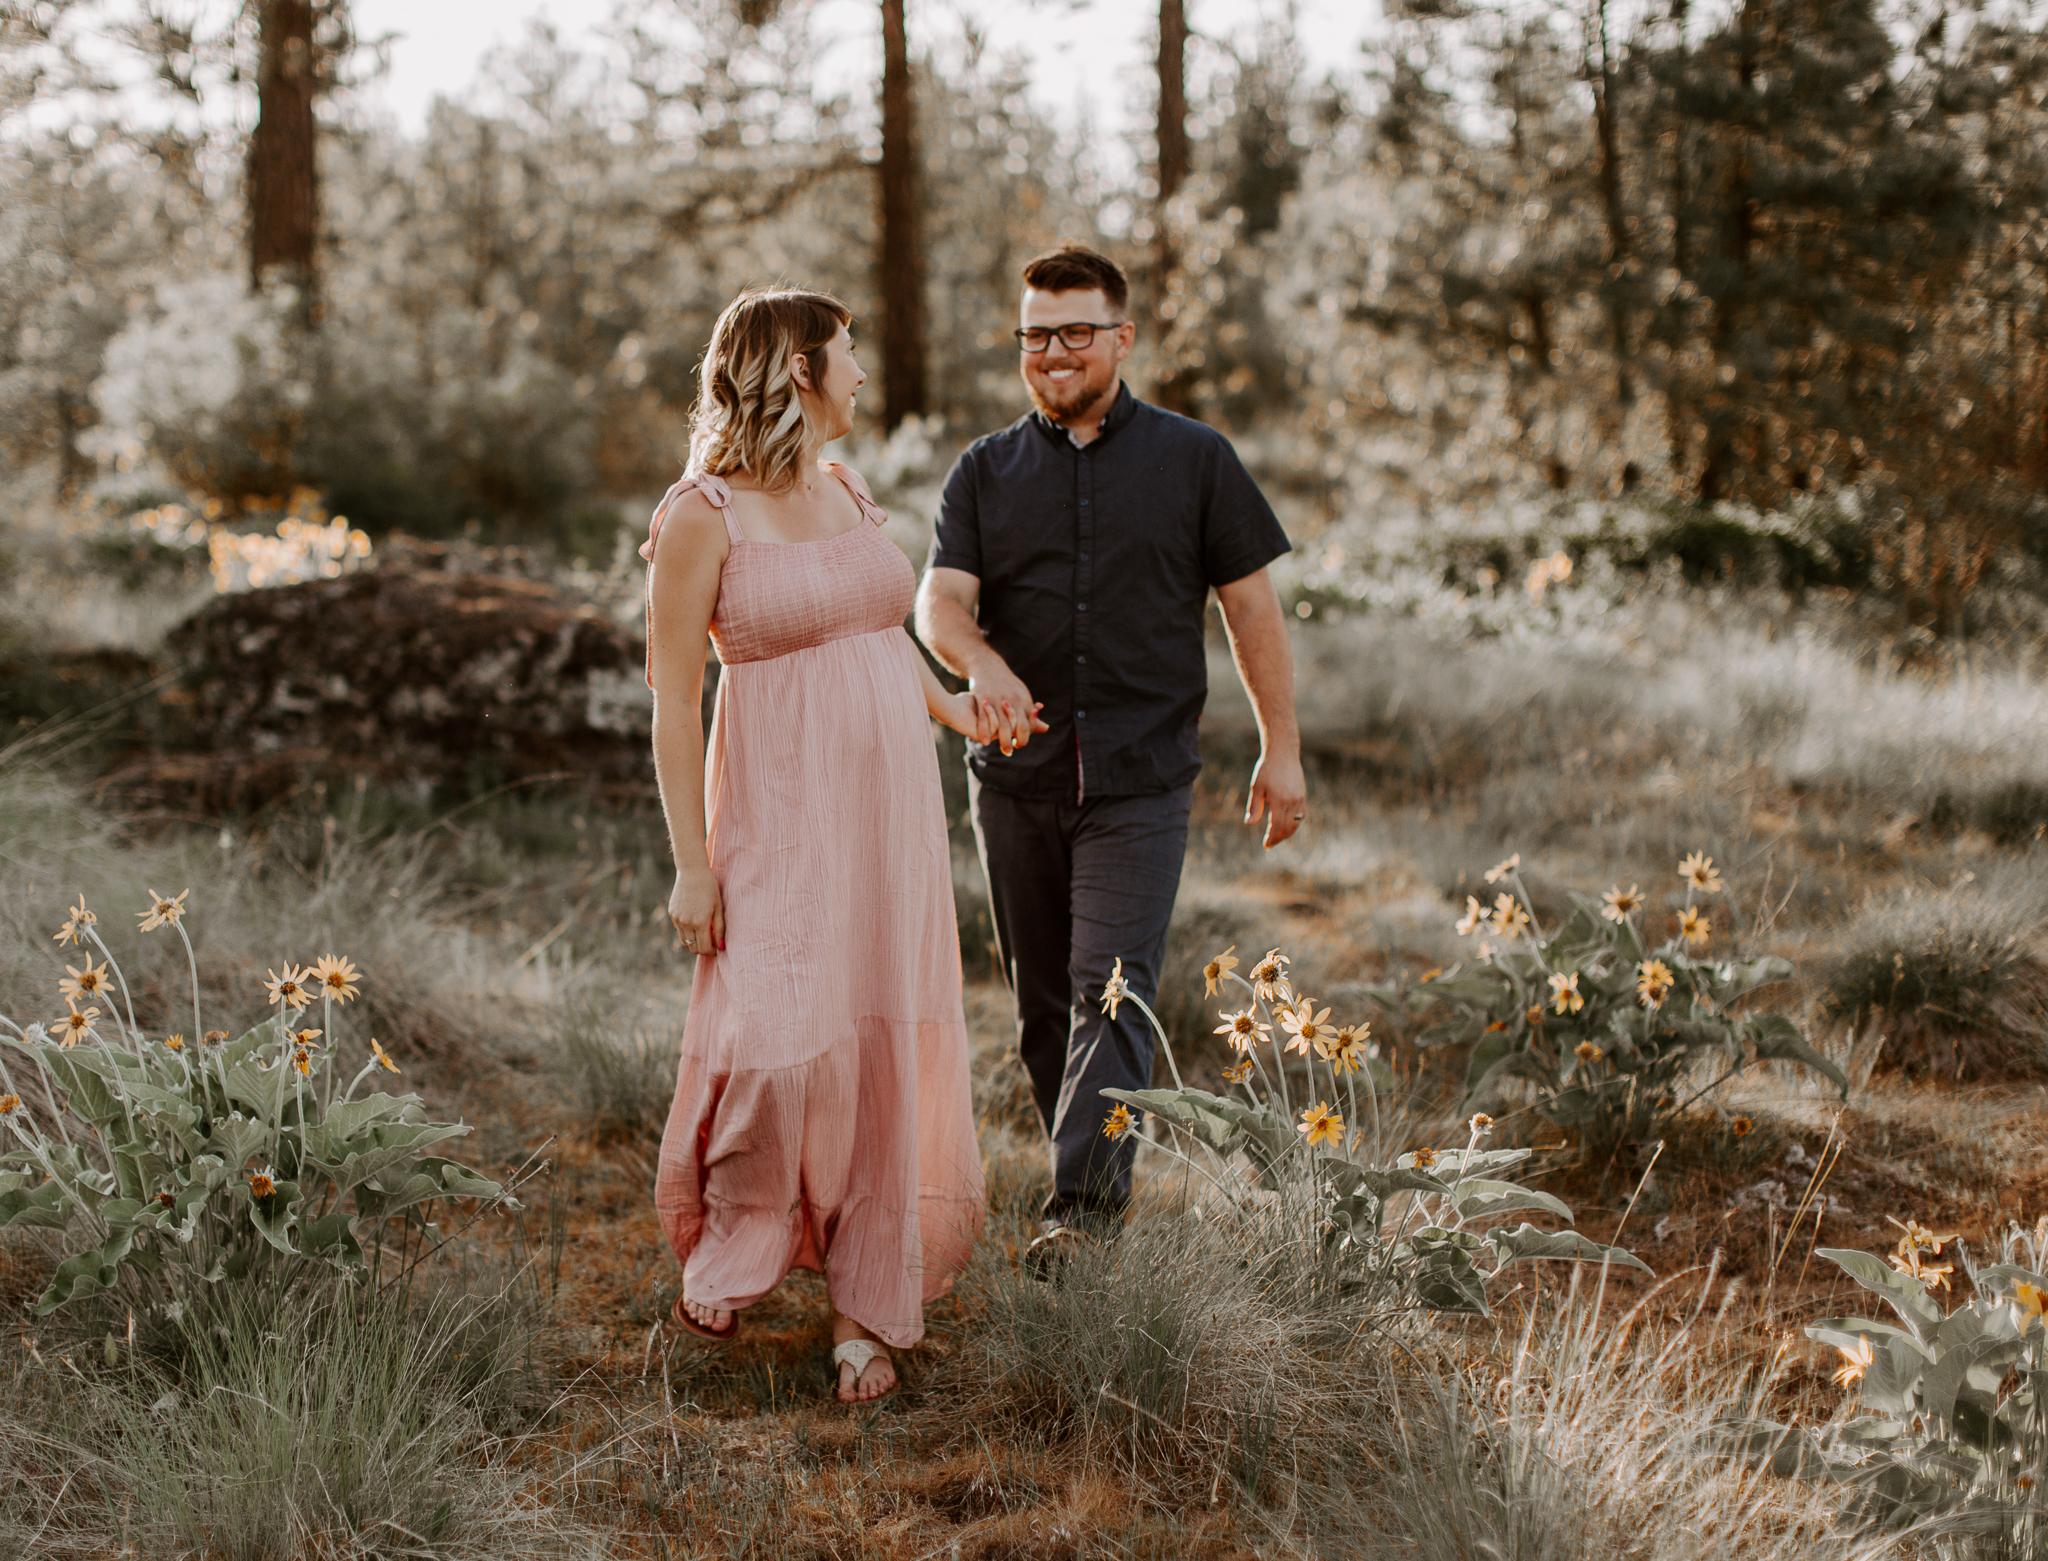 Russel-Maternity-Photos-Spokane-Wa-9.jpg